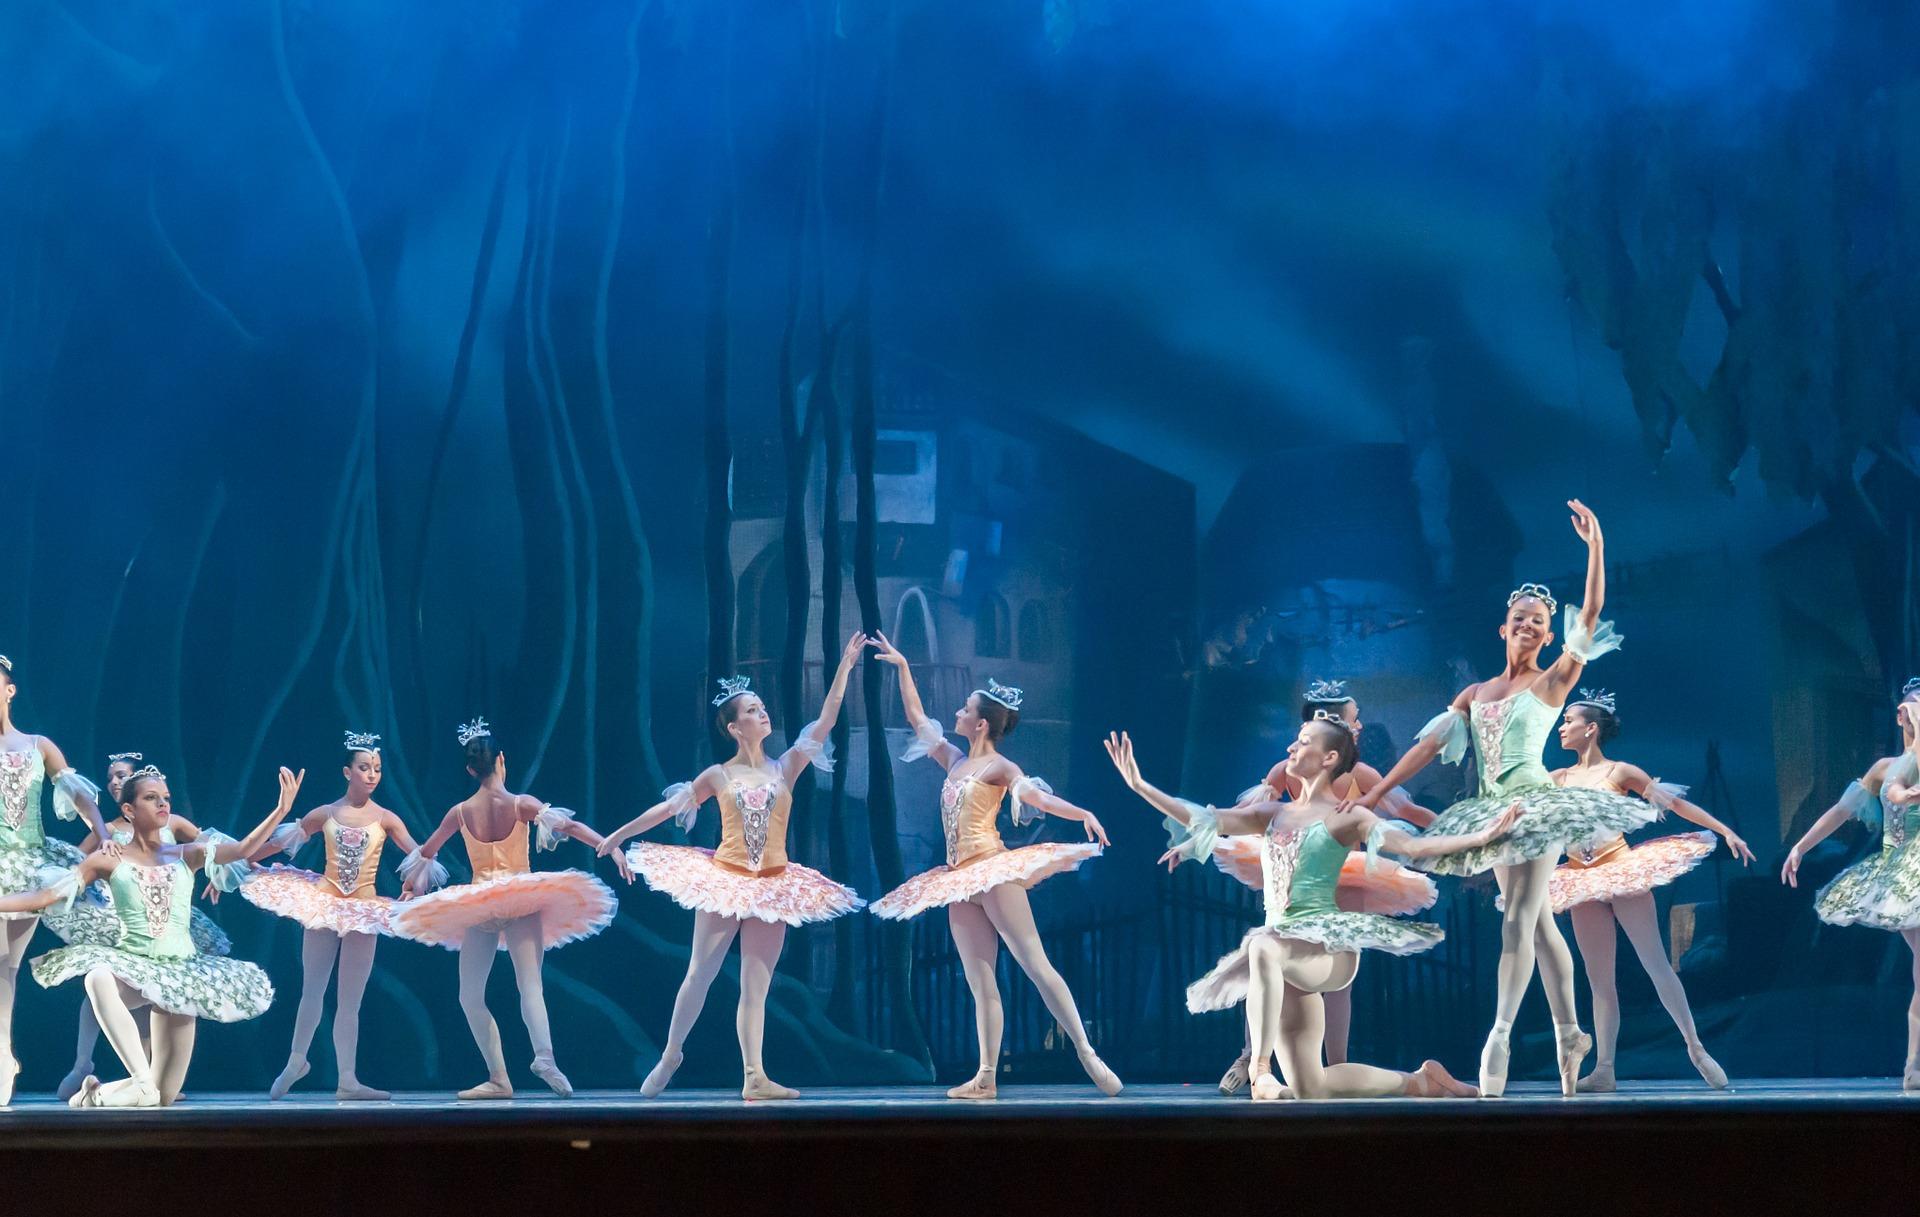 ballet-tutu-Transparente Eleganz - Tüll, Chiffon, Organza